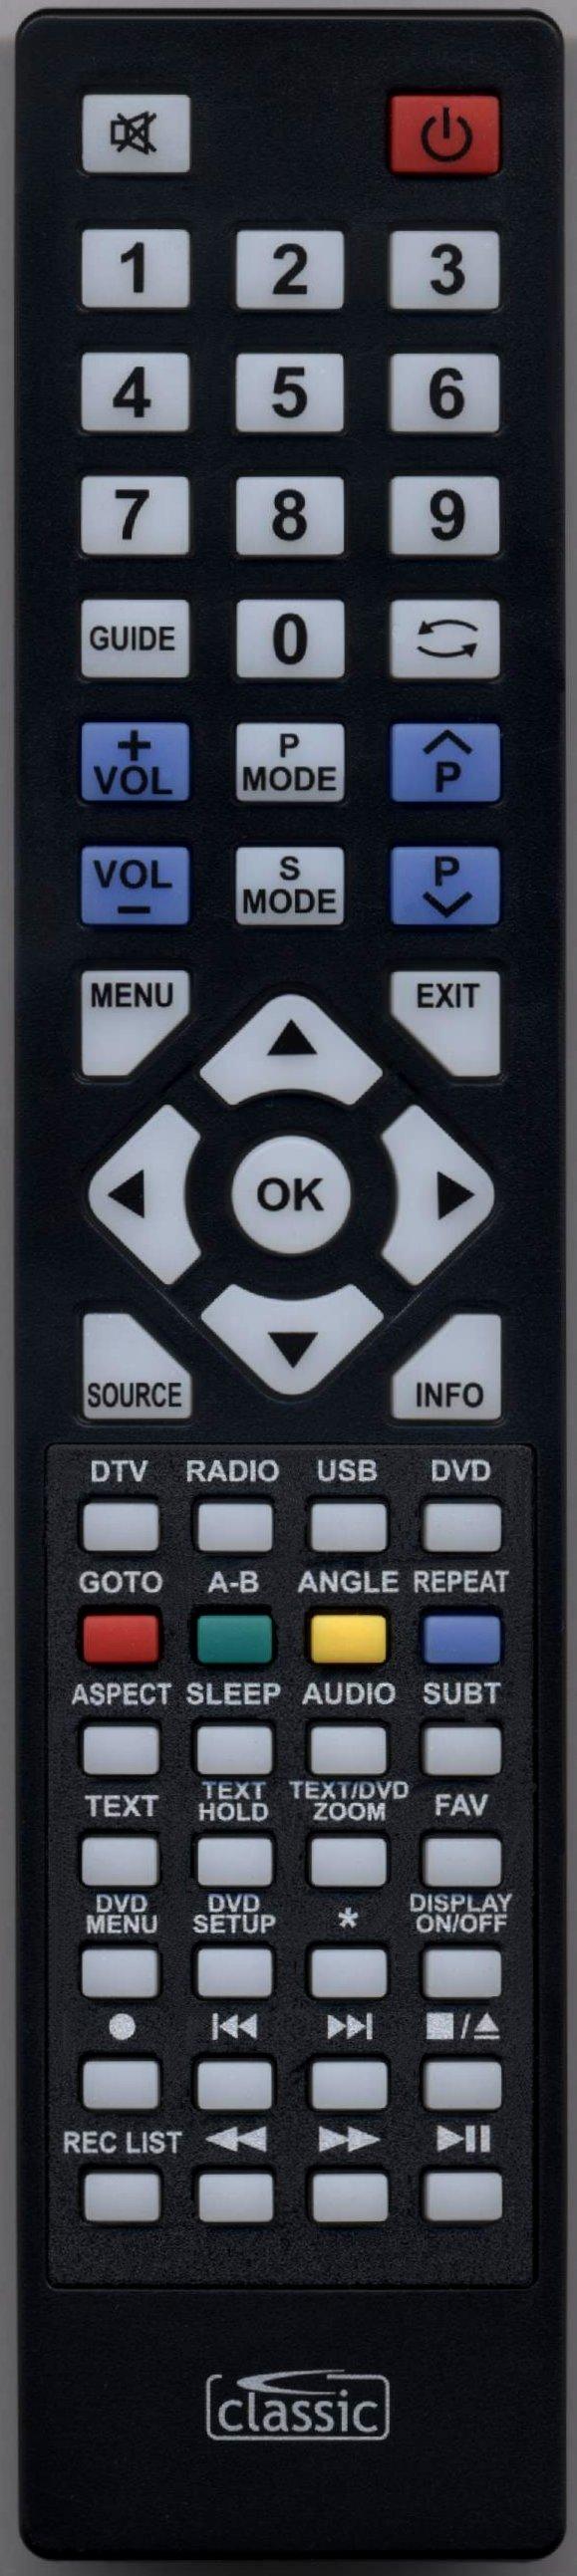 Blaupunkt 24-2071-GB-3B-FHKDUP-UK Remote Control